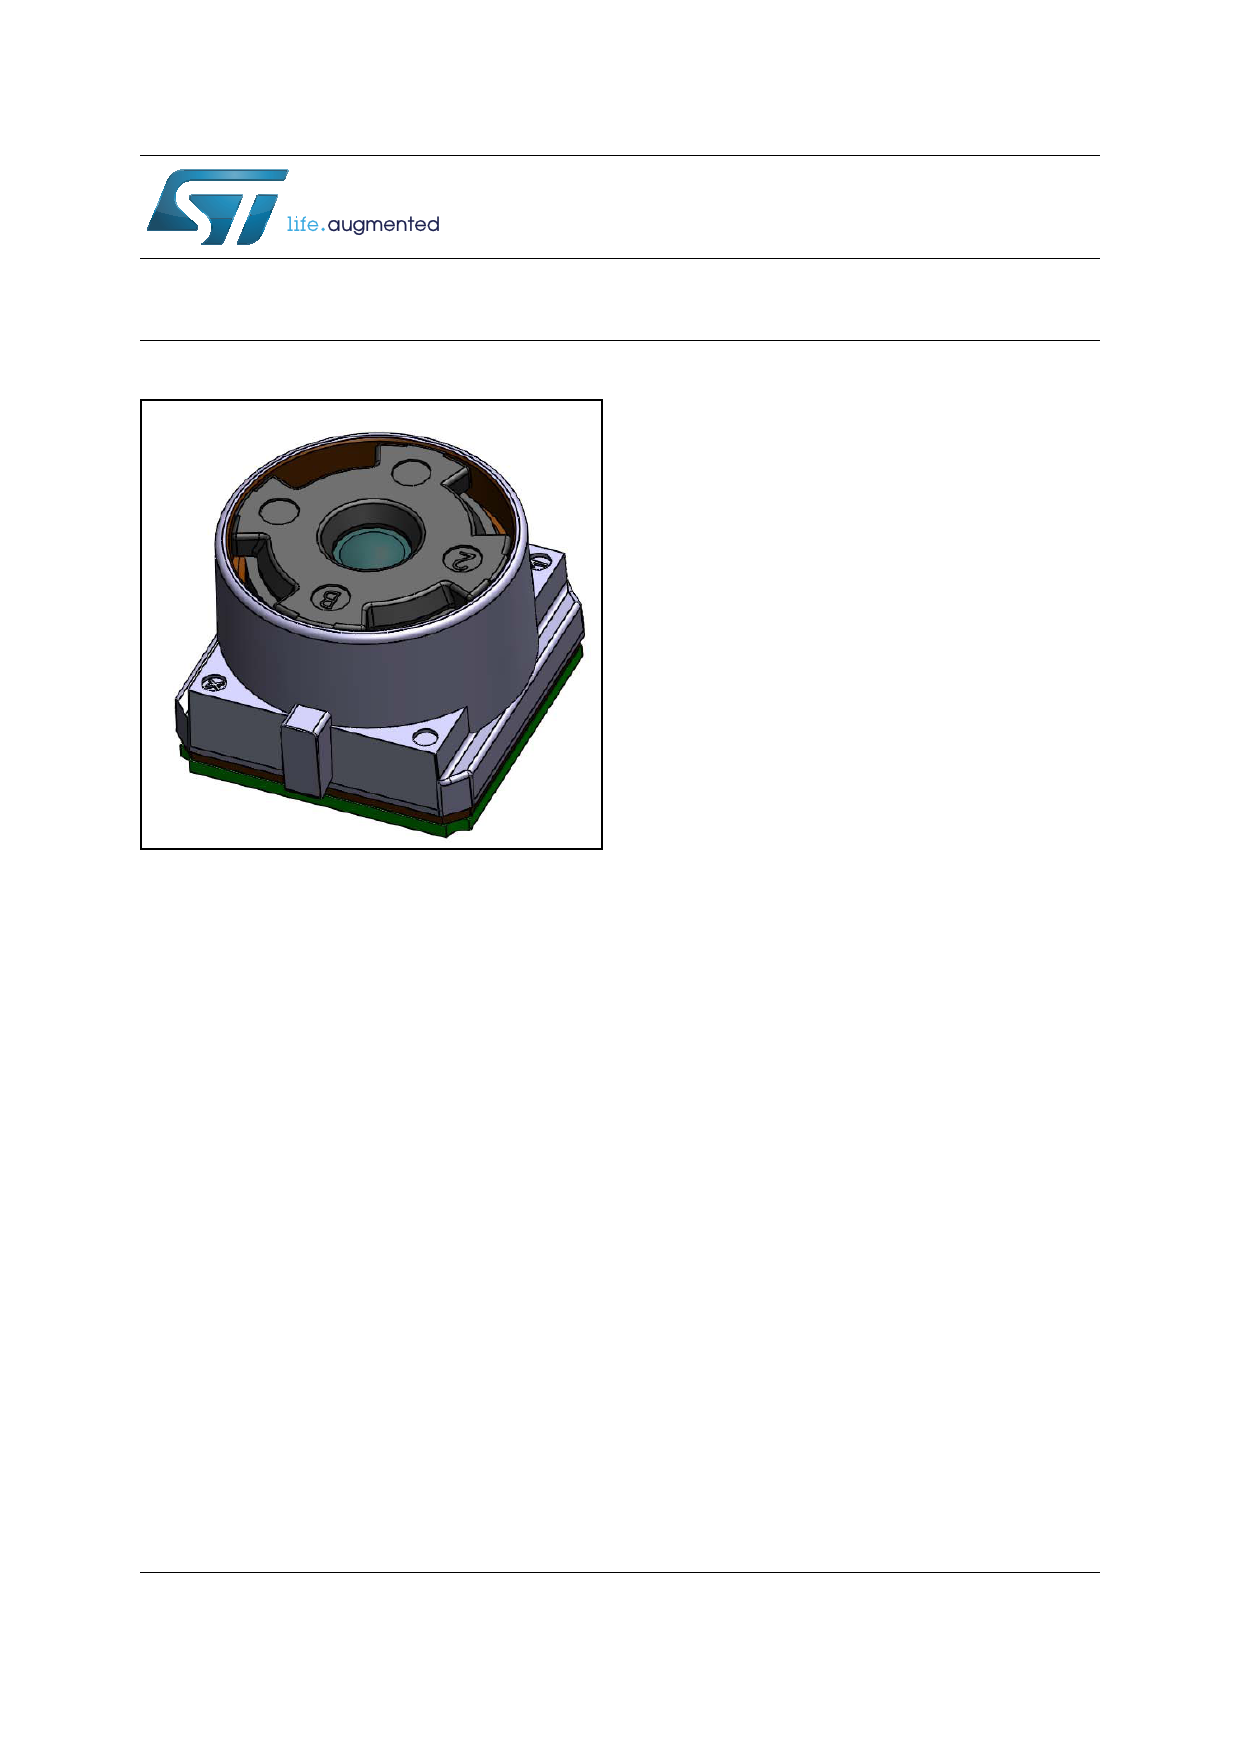 VX6953CB datasheet, circuit